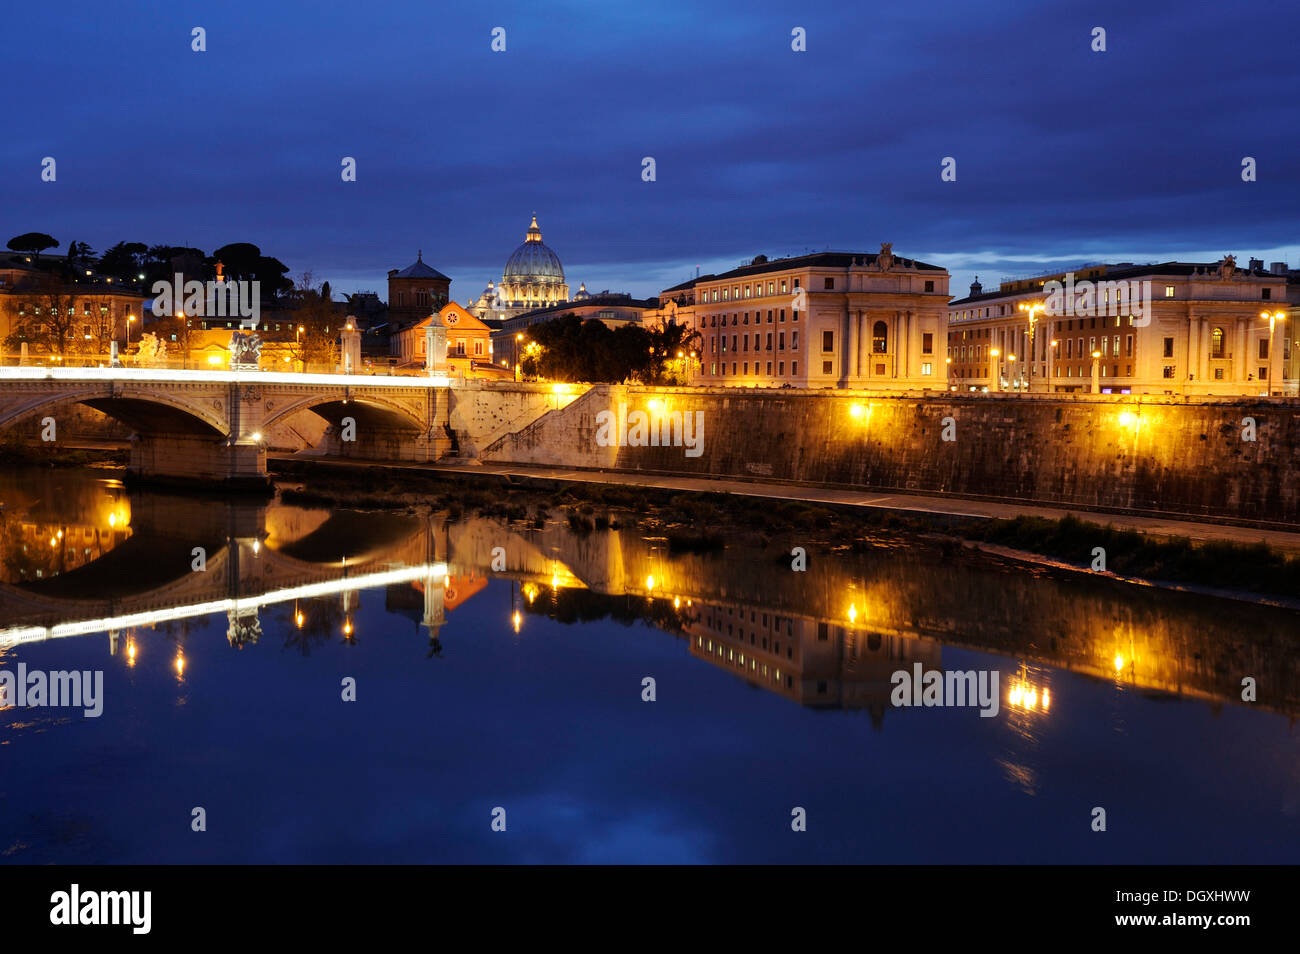 Ponte Vittorio Emmanuel II over the Tiber river at dusk, Vatican, Rome, Italy, Europe Stock Photo